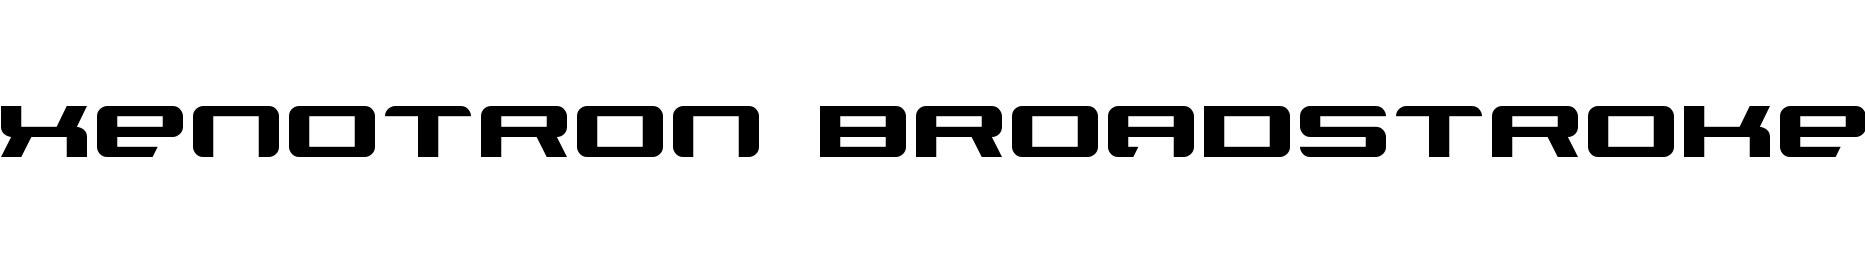 Xenotron Broadstroke